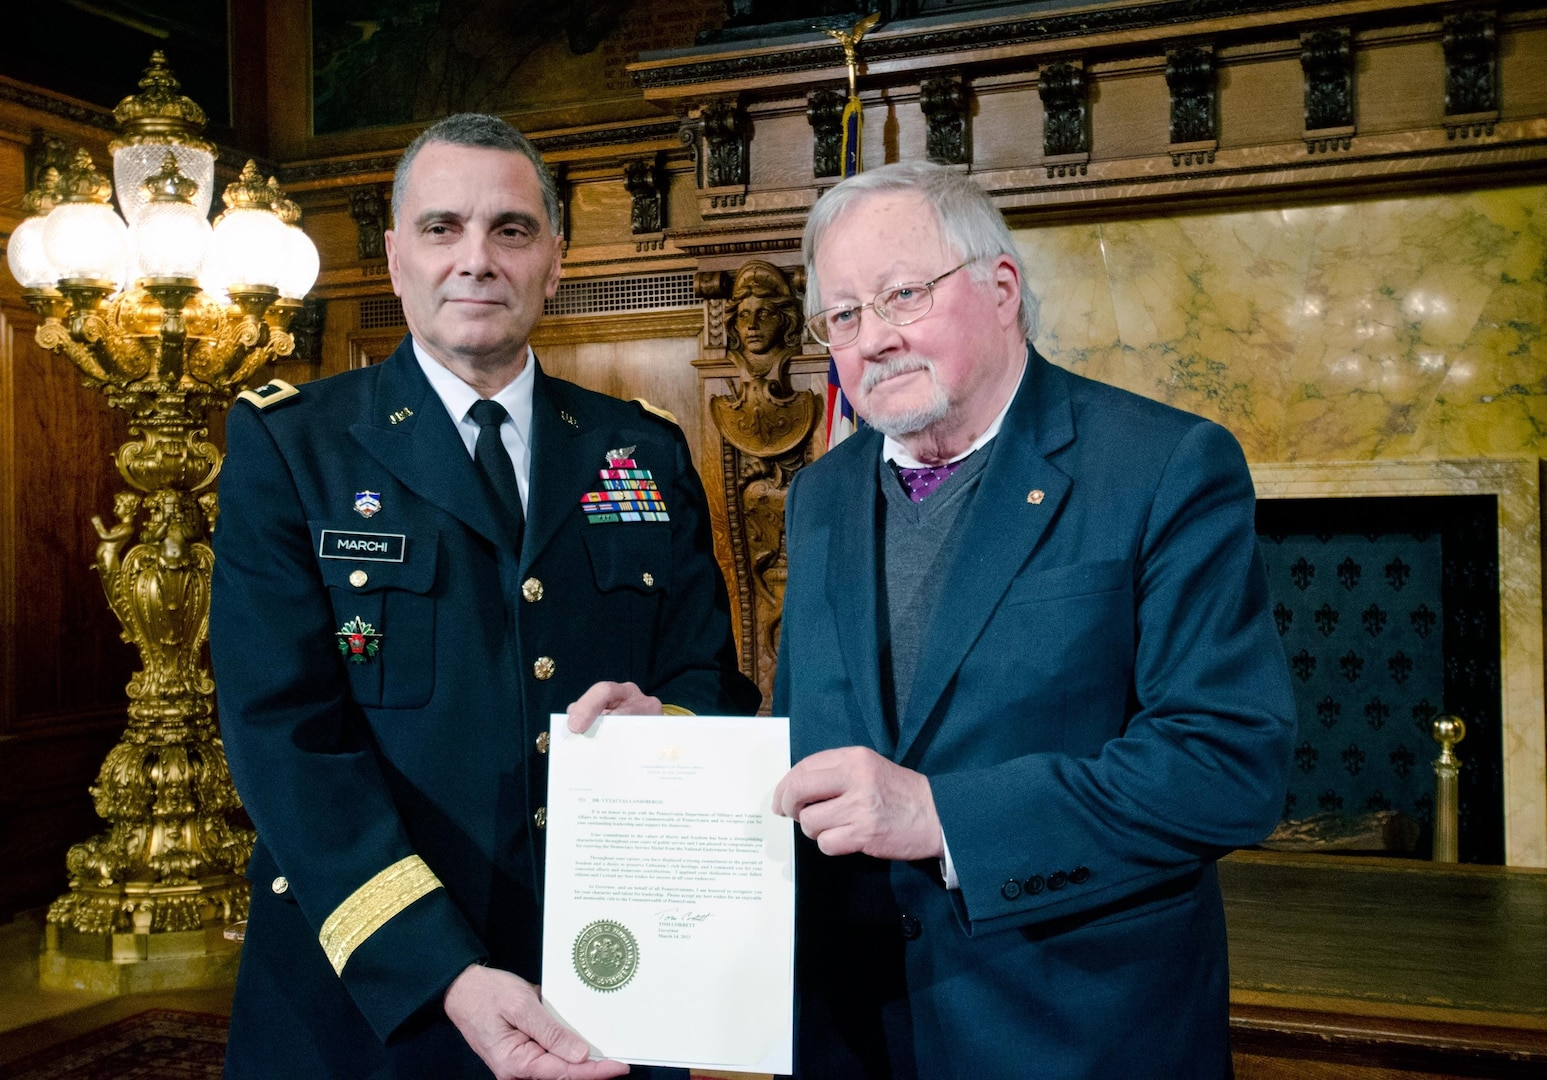 Maj. Gen. Randall Marchi, Pennsylvania deputy adjutant general-Army, on behalf of Pennsylvania Gov. Tom Corbett, recognized Vytautas Landsbergis with a proclamation.